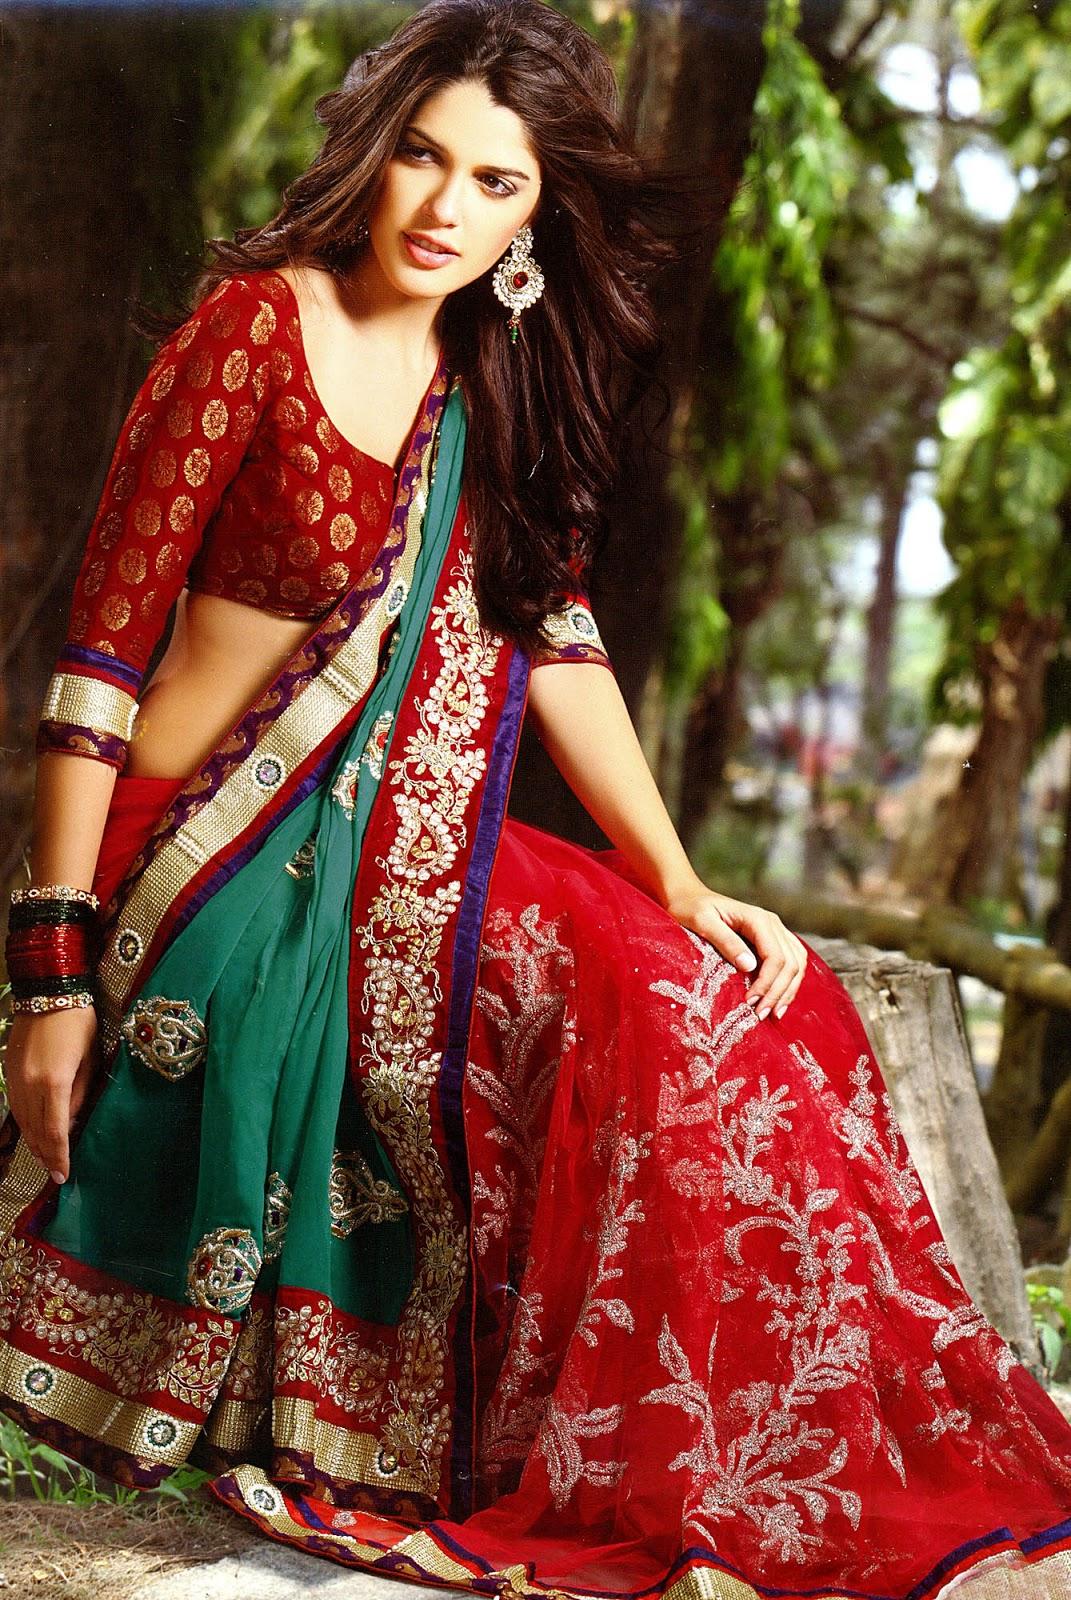 to wear - Fashion indian world wallpaper video